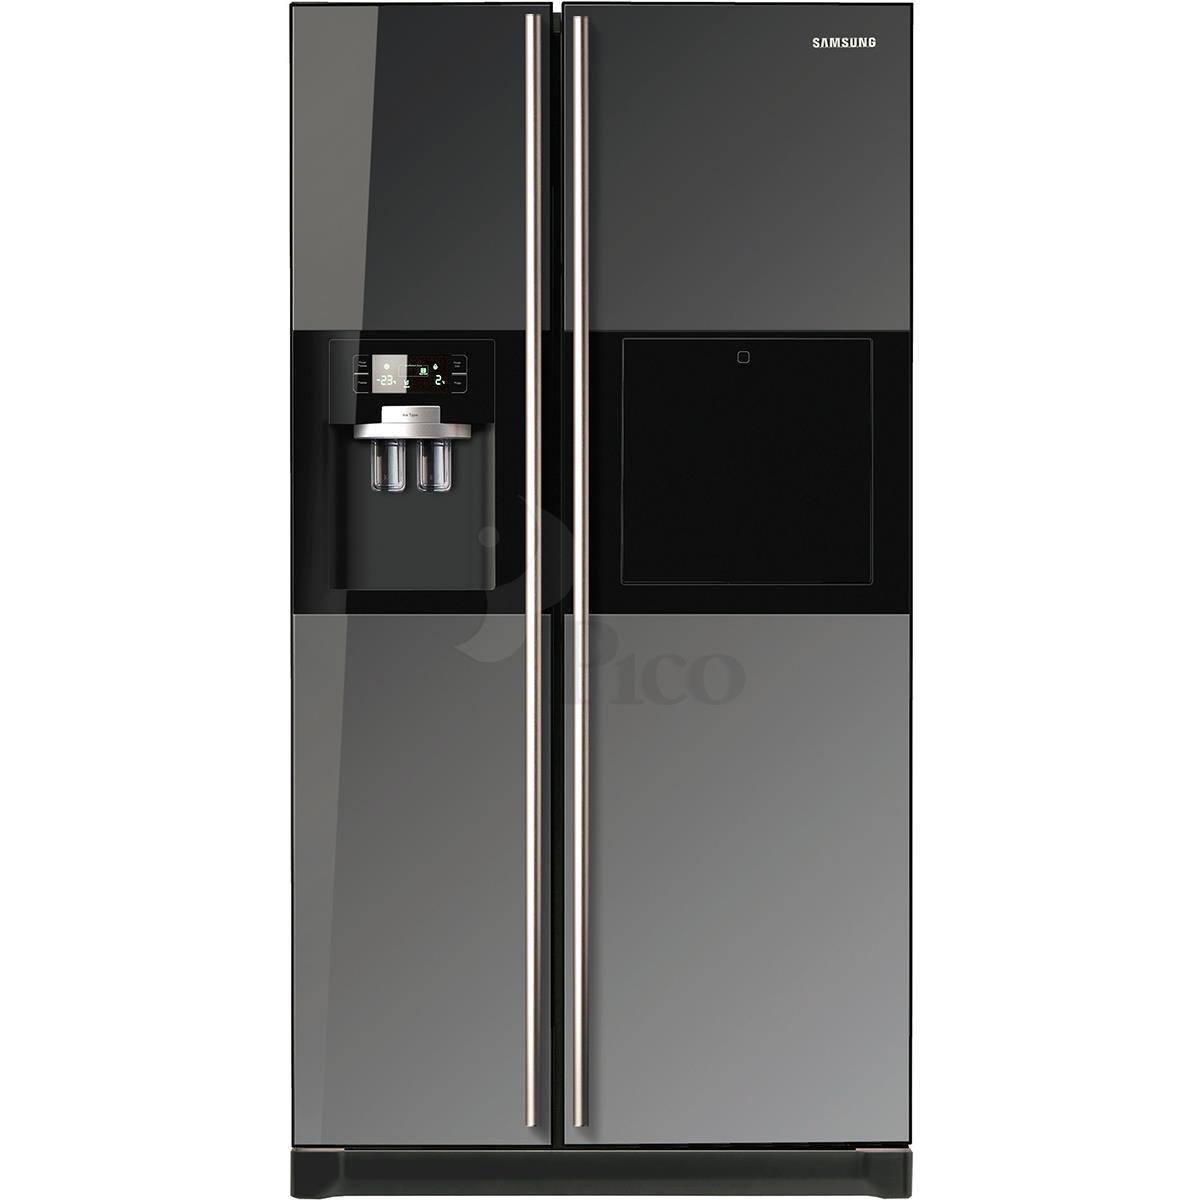 Samsung RS21HKLMR1/XSV